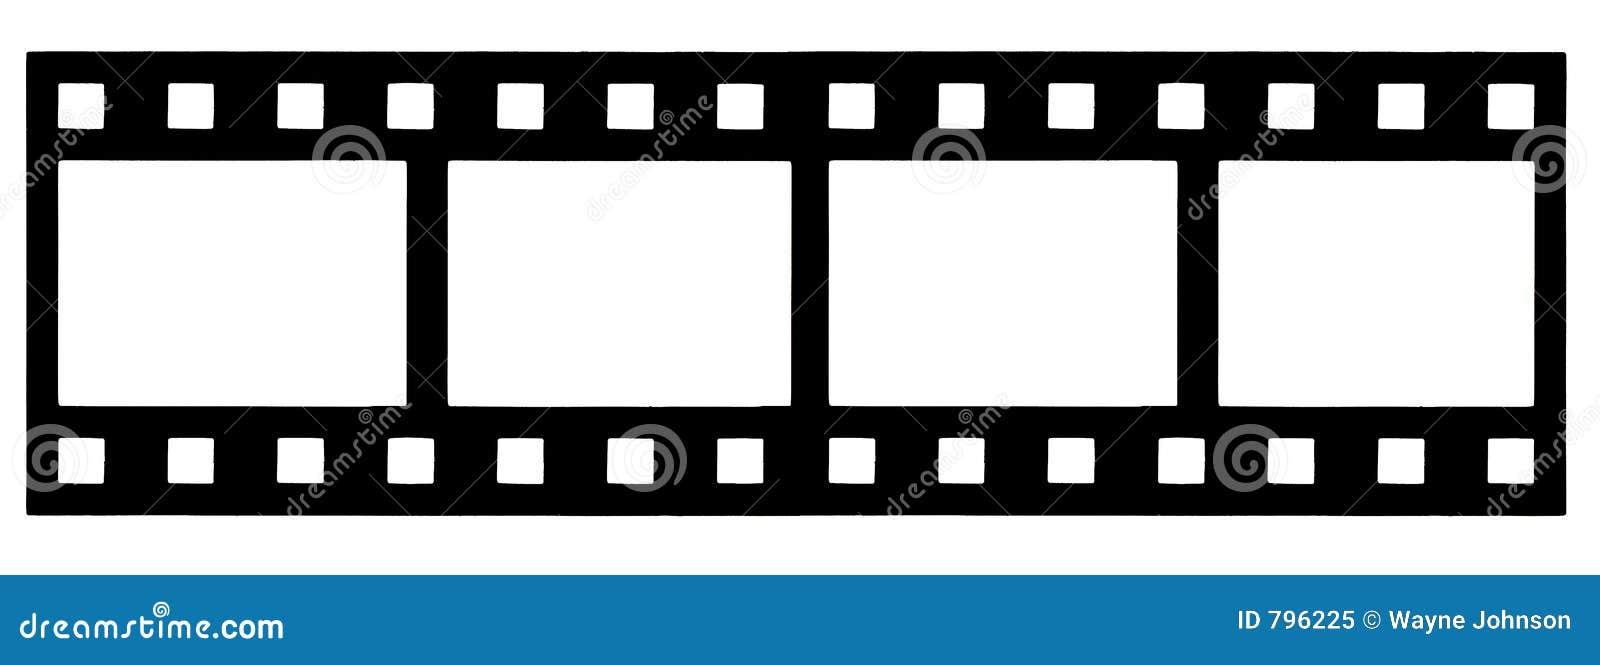 printable film strip template - filmstrip stock illustration illustration of flick